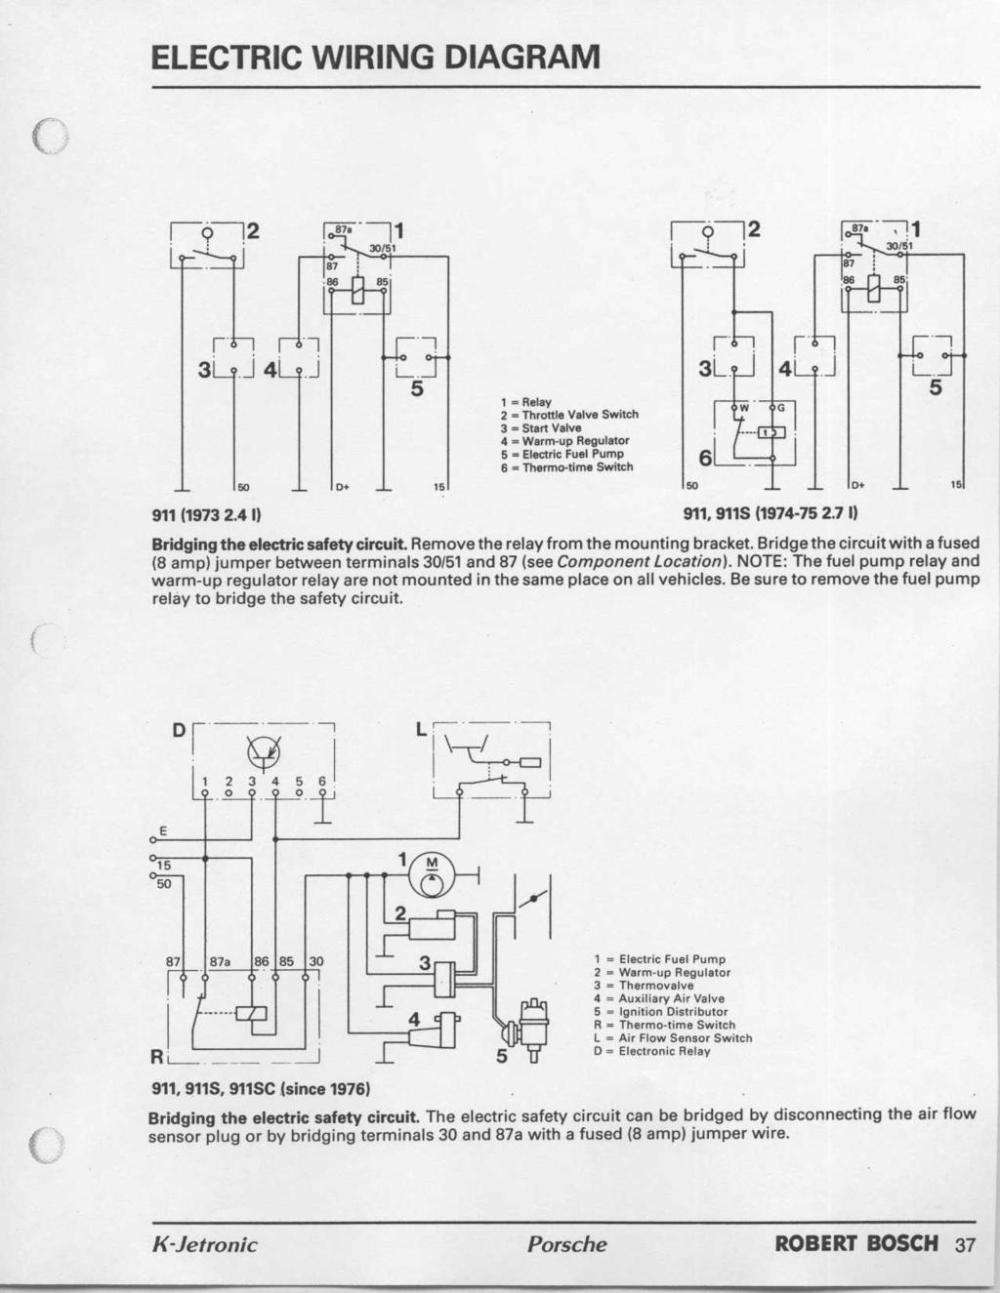 medium resolution of electric wiring diagram 87a 11 30 51 0 87 86 5 87a 1 30